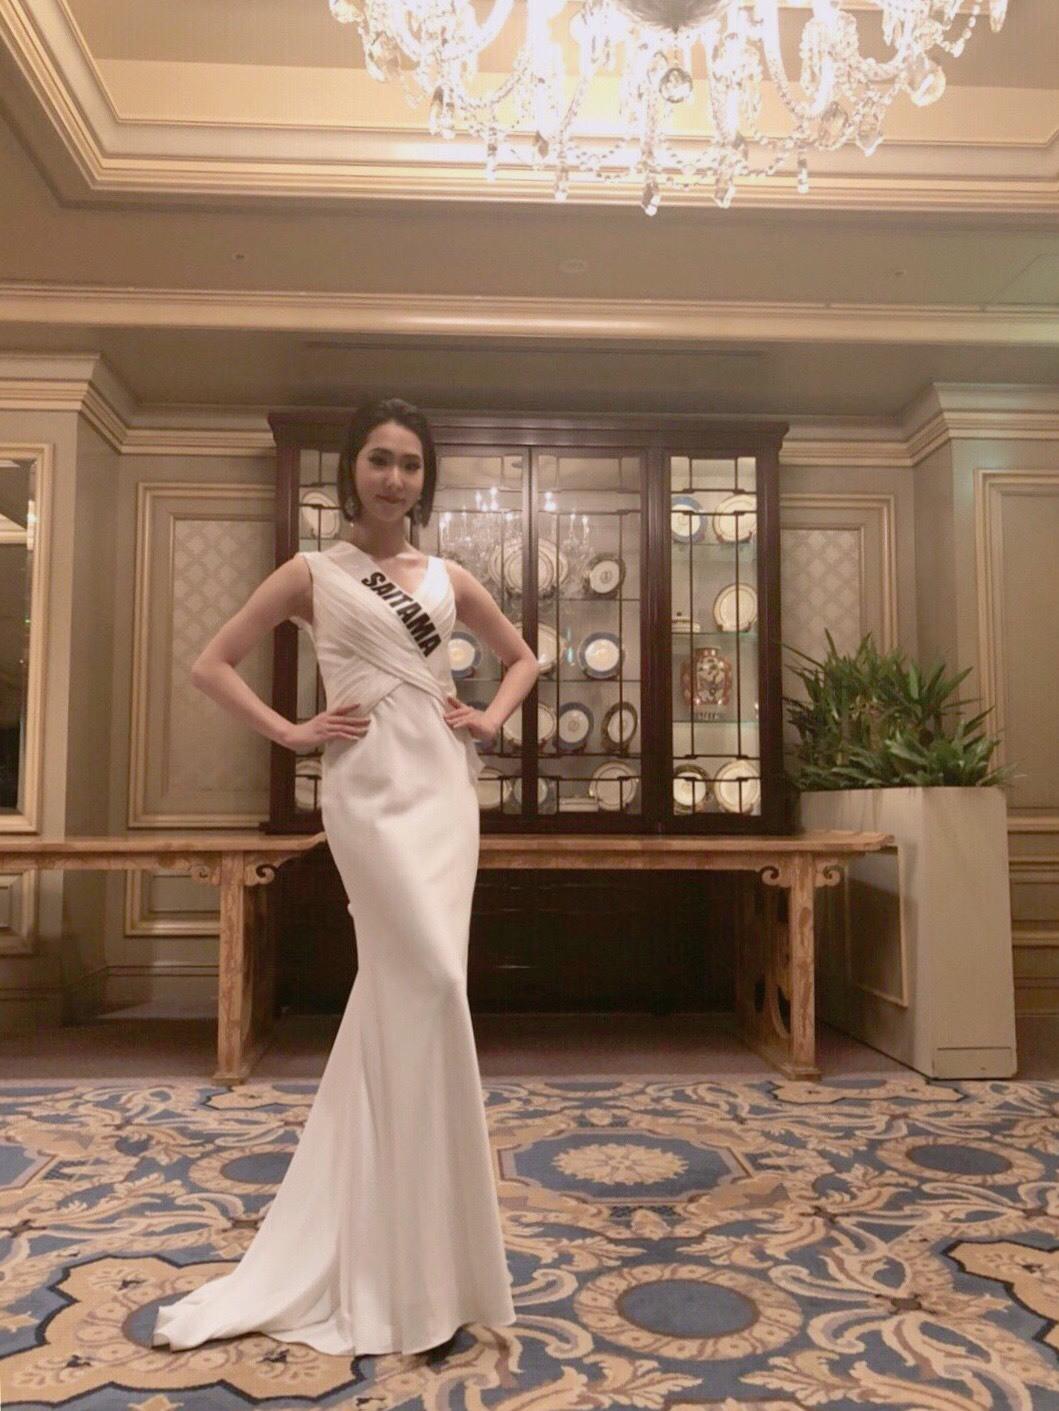 【 第98回❤︎ 】2018 Miss Universe Japan_1_1